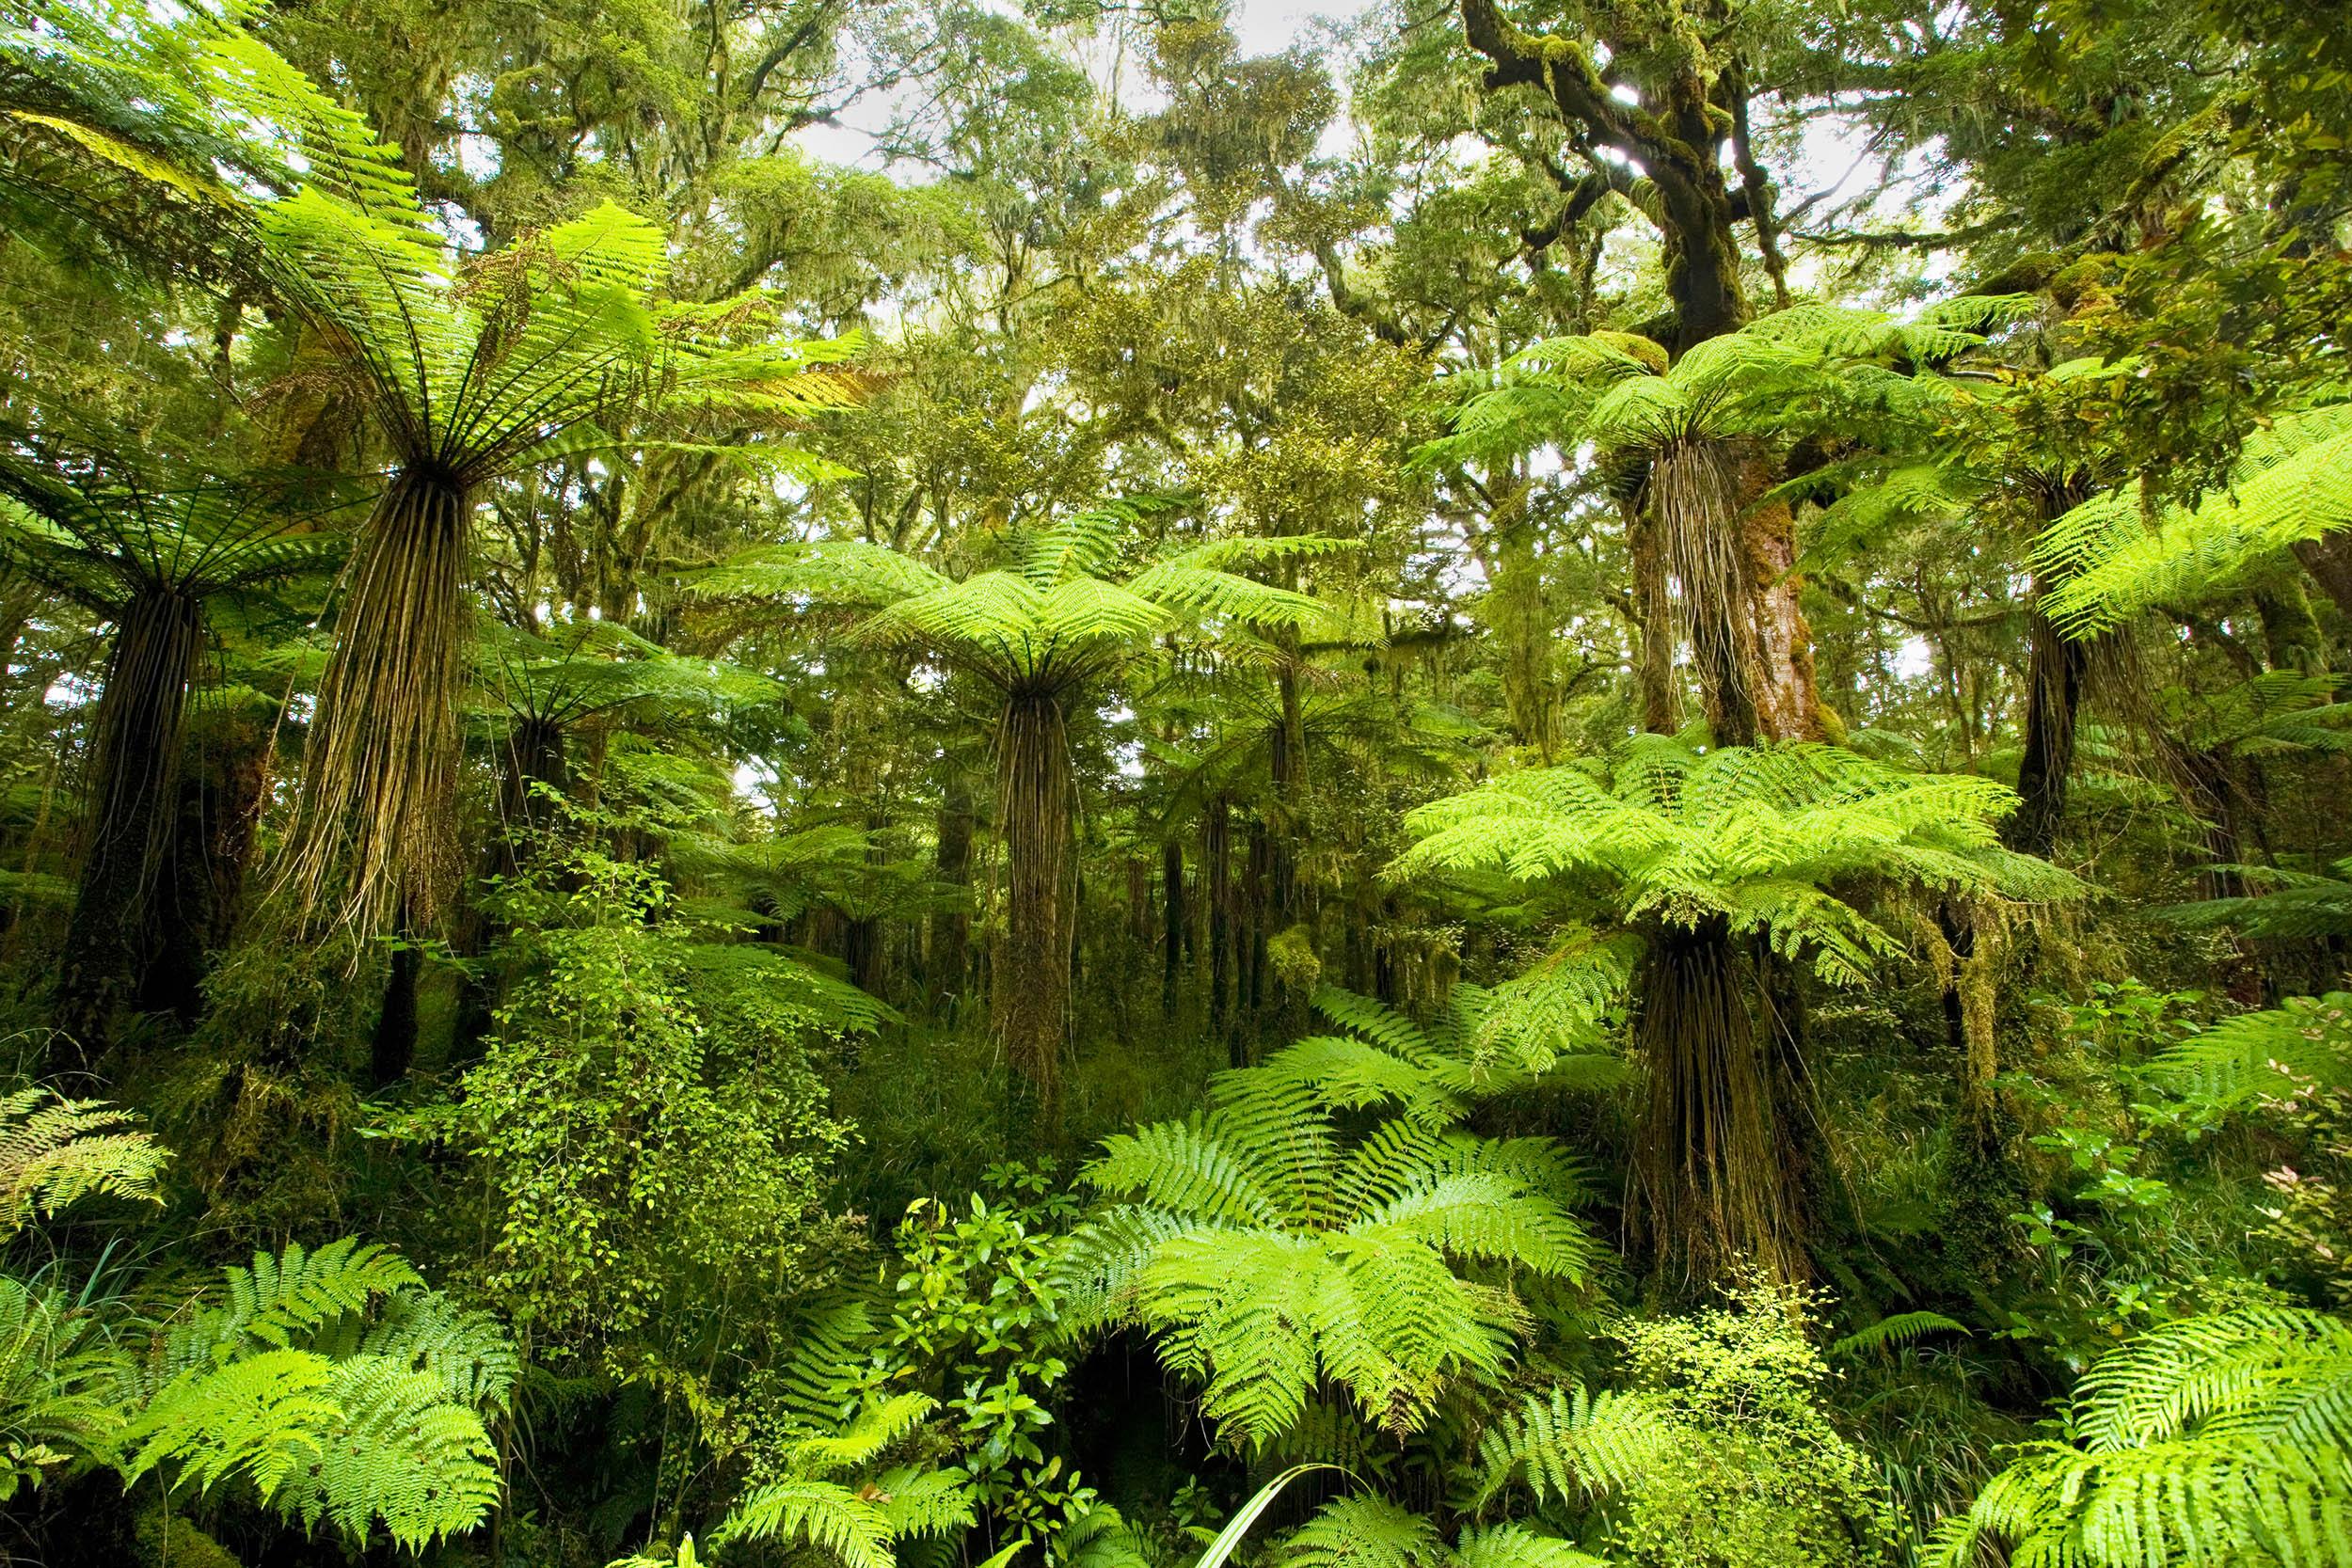 Pteridophytes - ferns